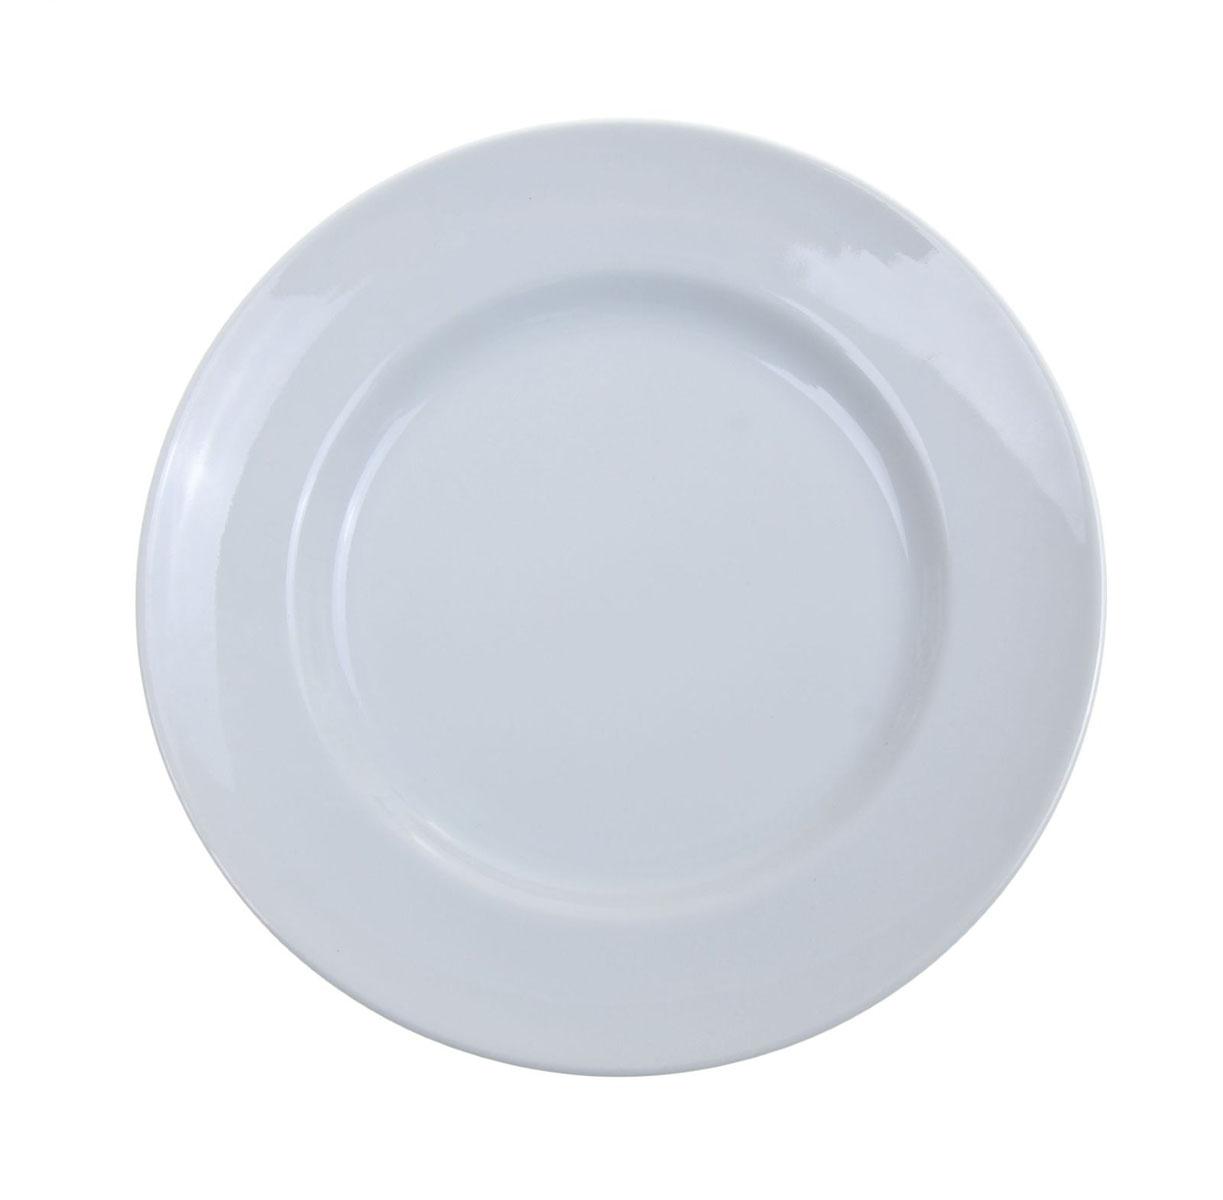 Тарелка мелкая Идиллия. Белье, диаметр 20 см1063080